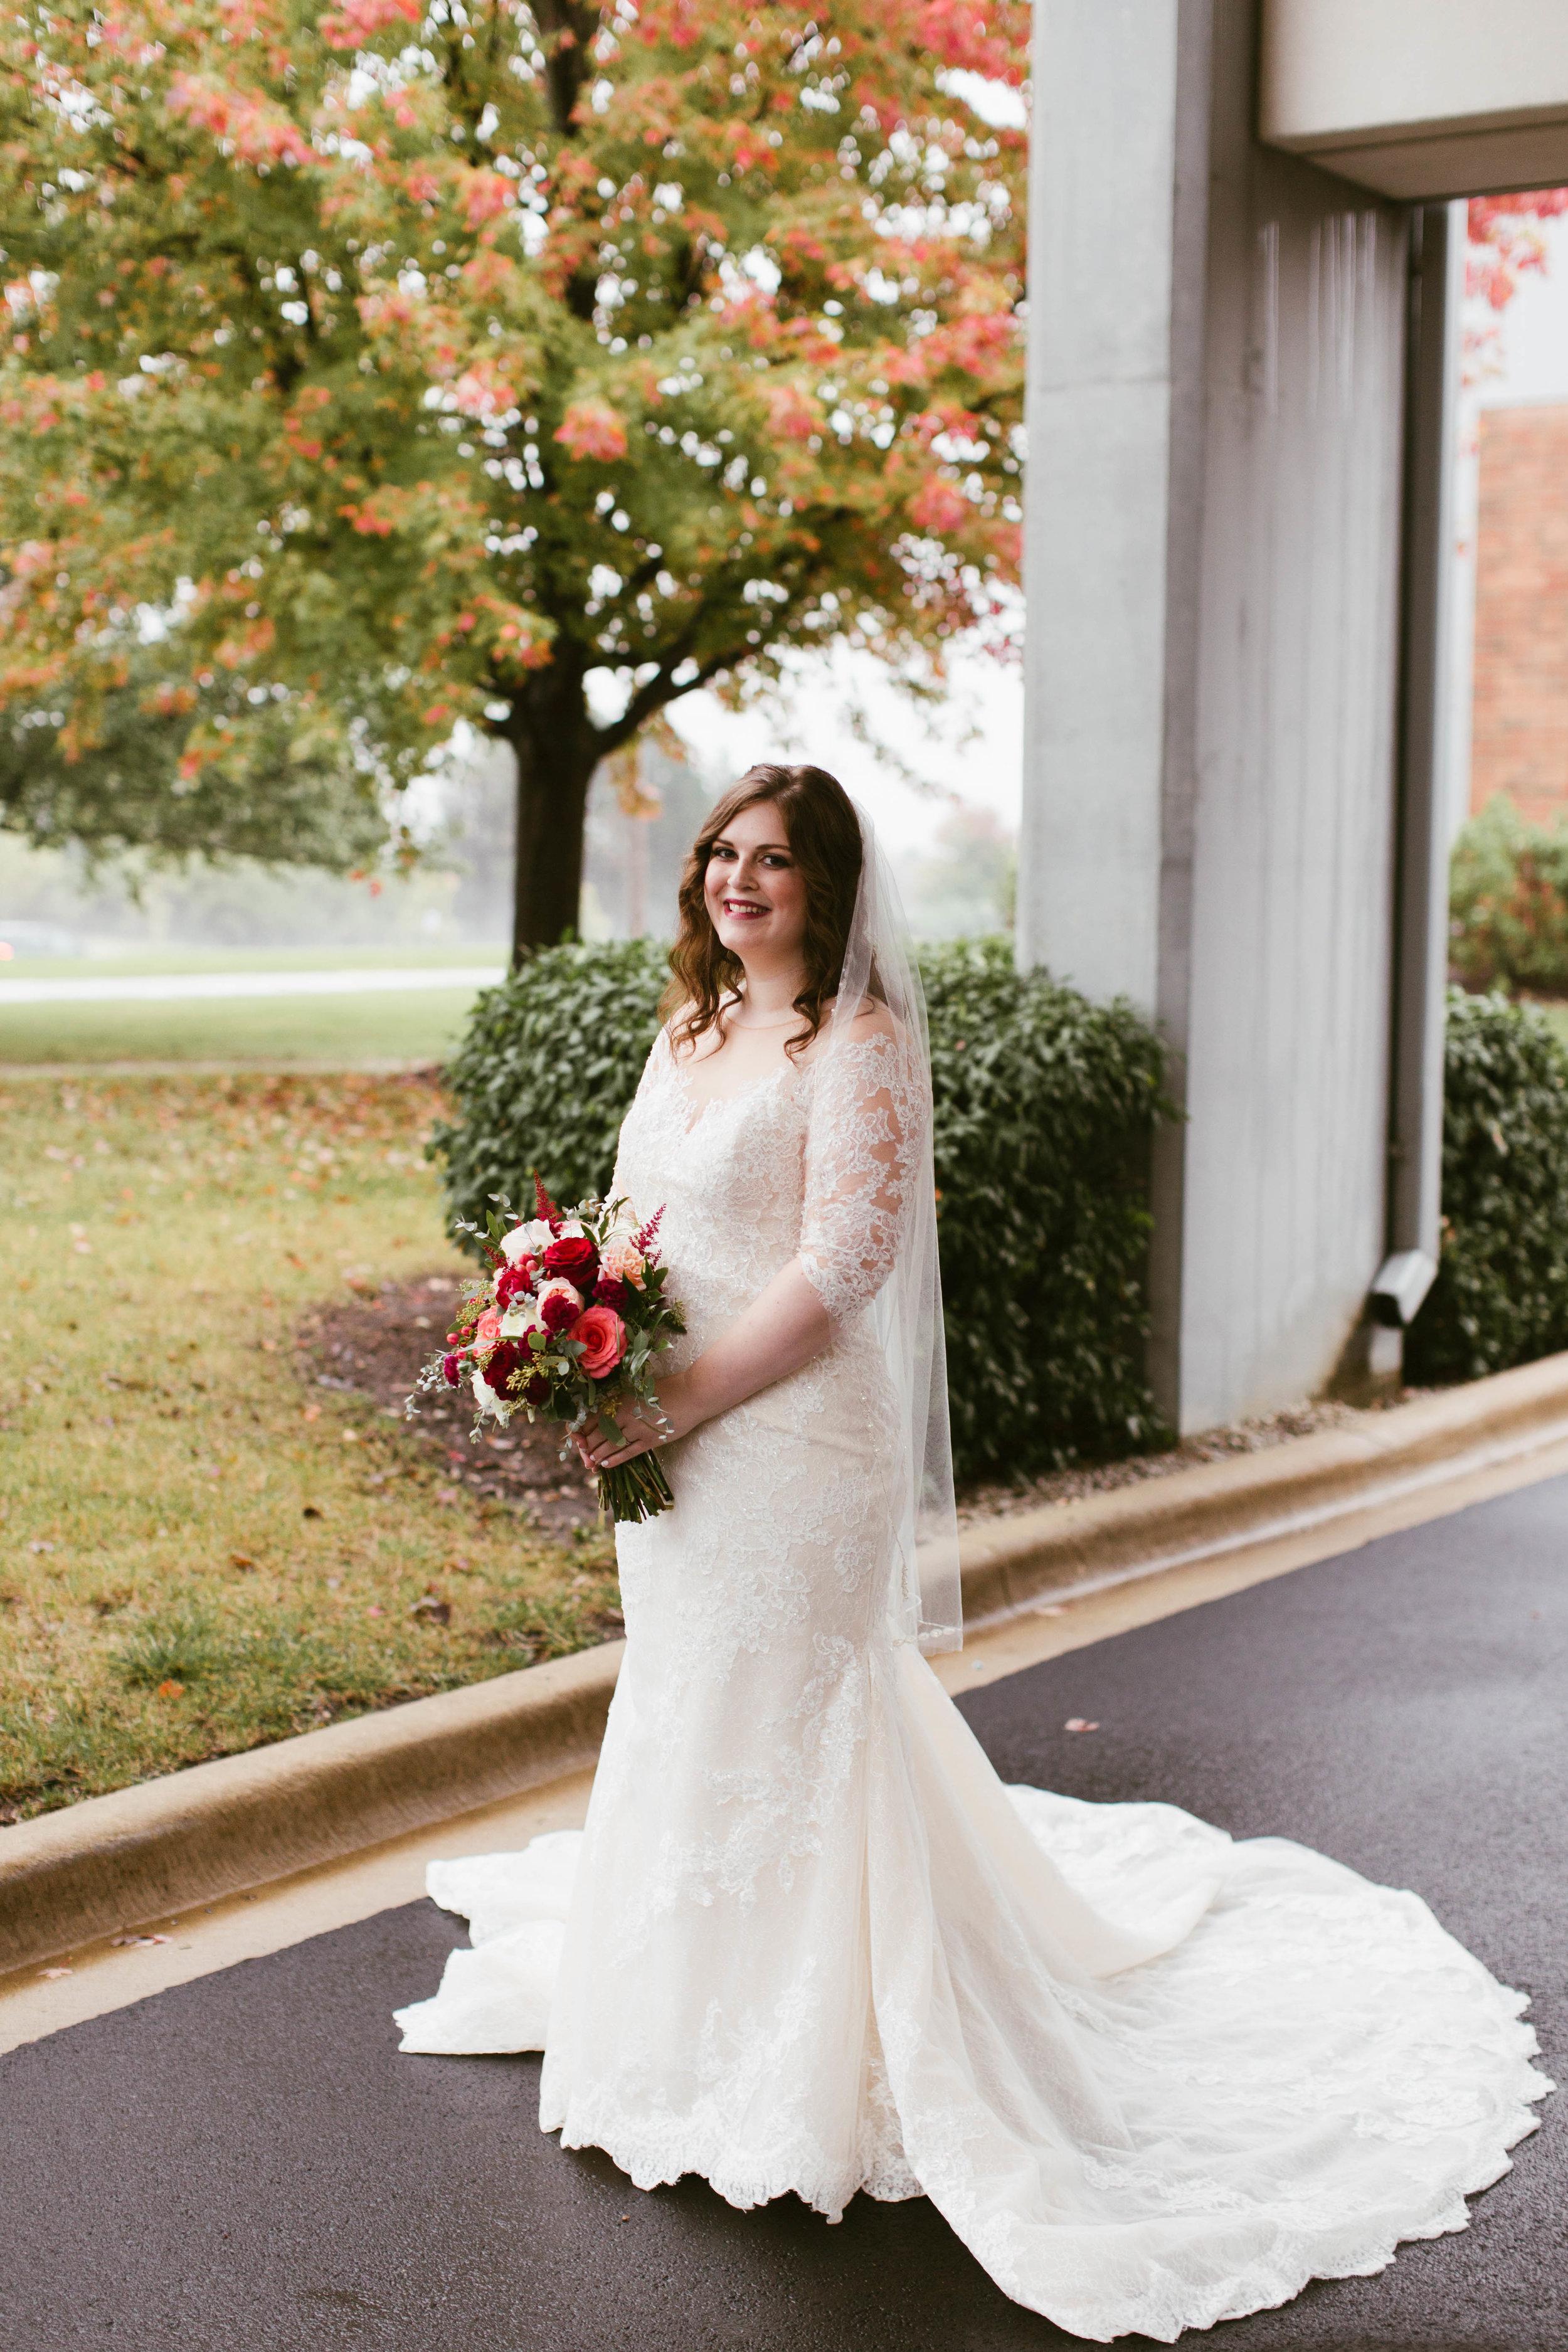 jennahazelphotography-marcy+ben-wedding-0250.jpg